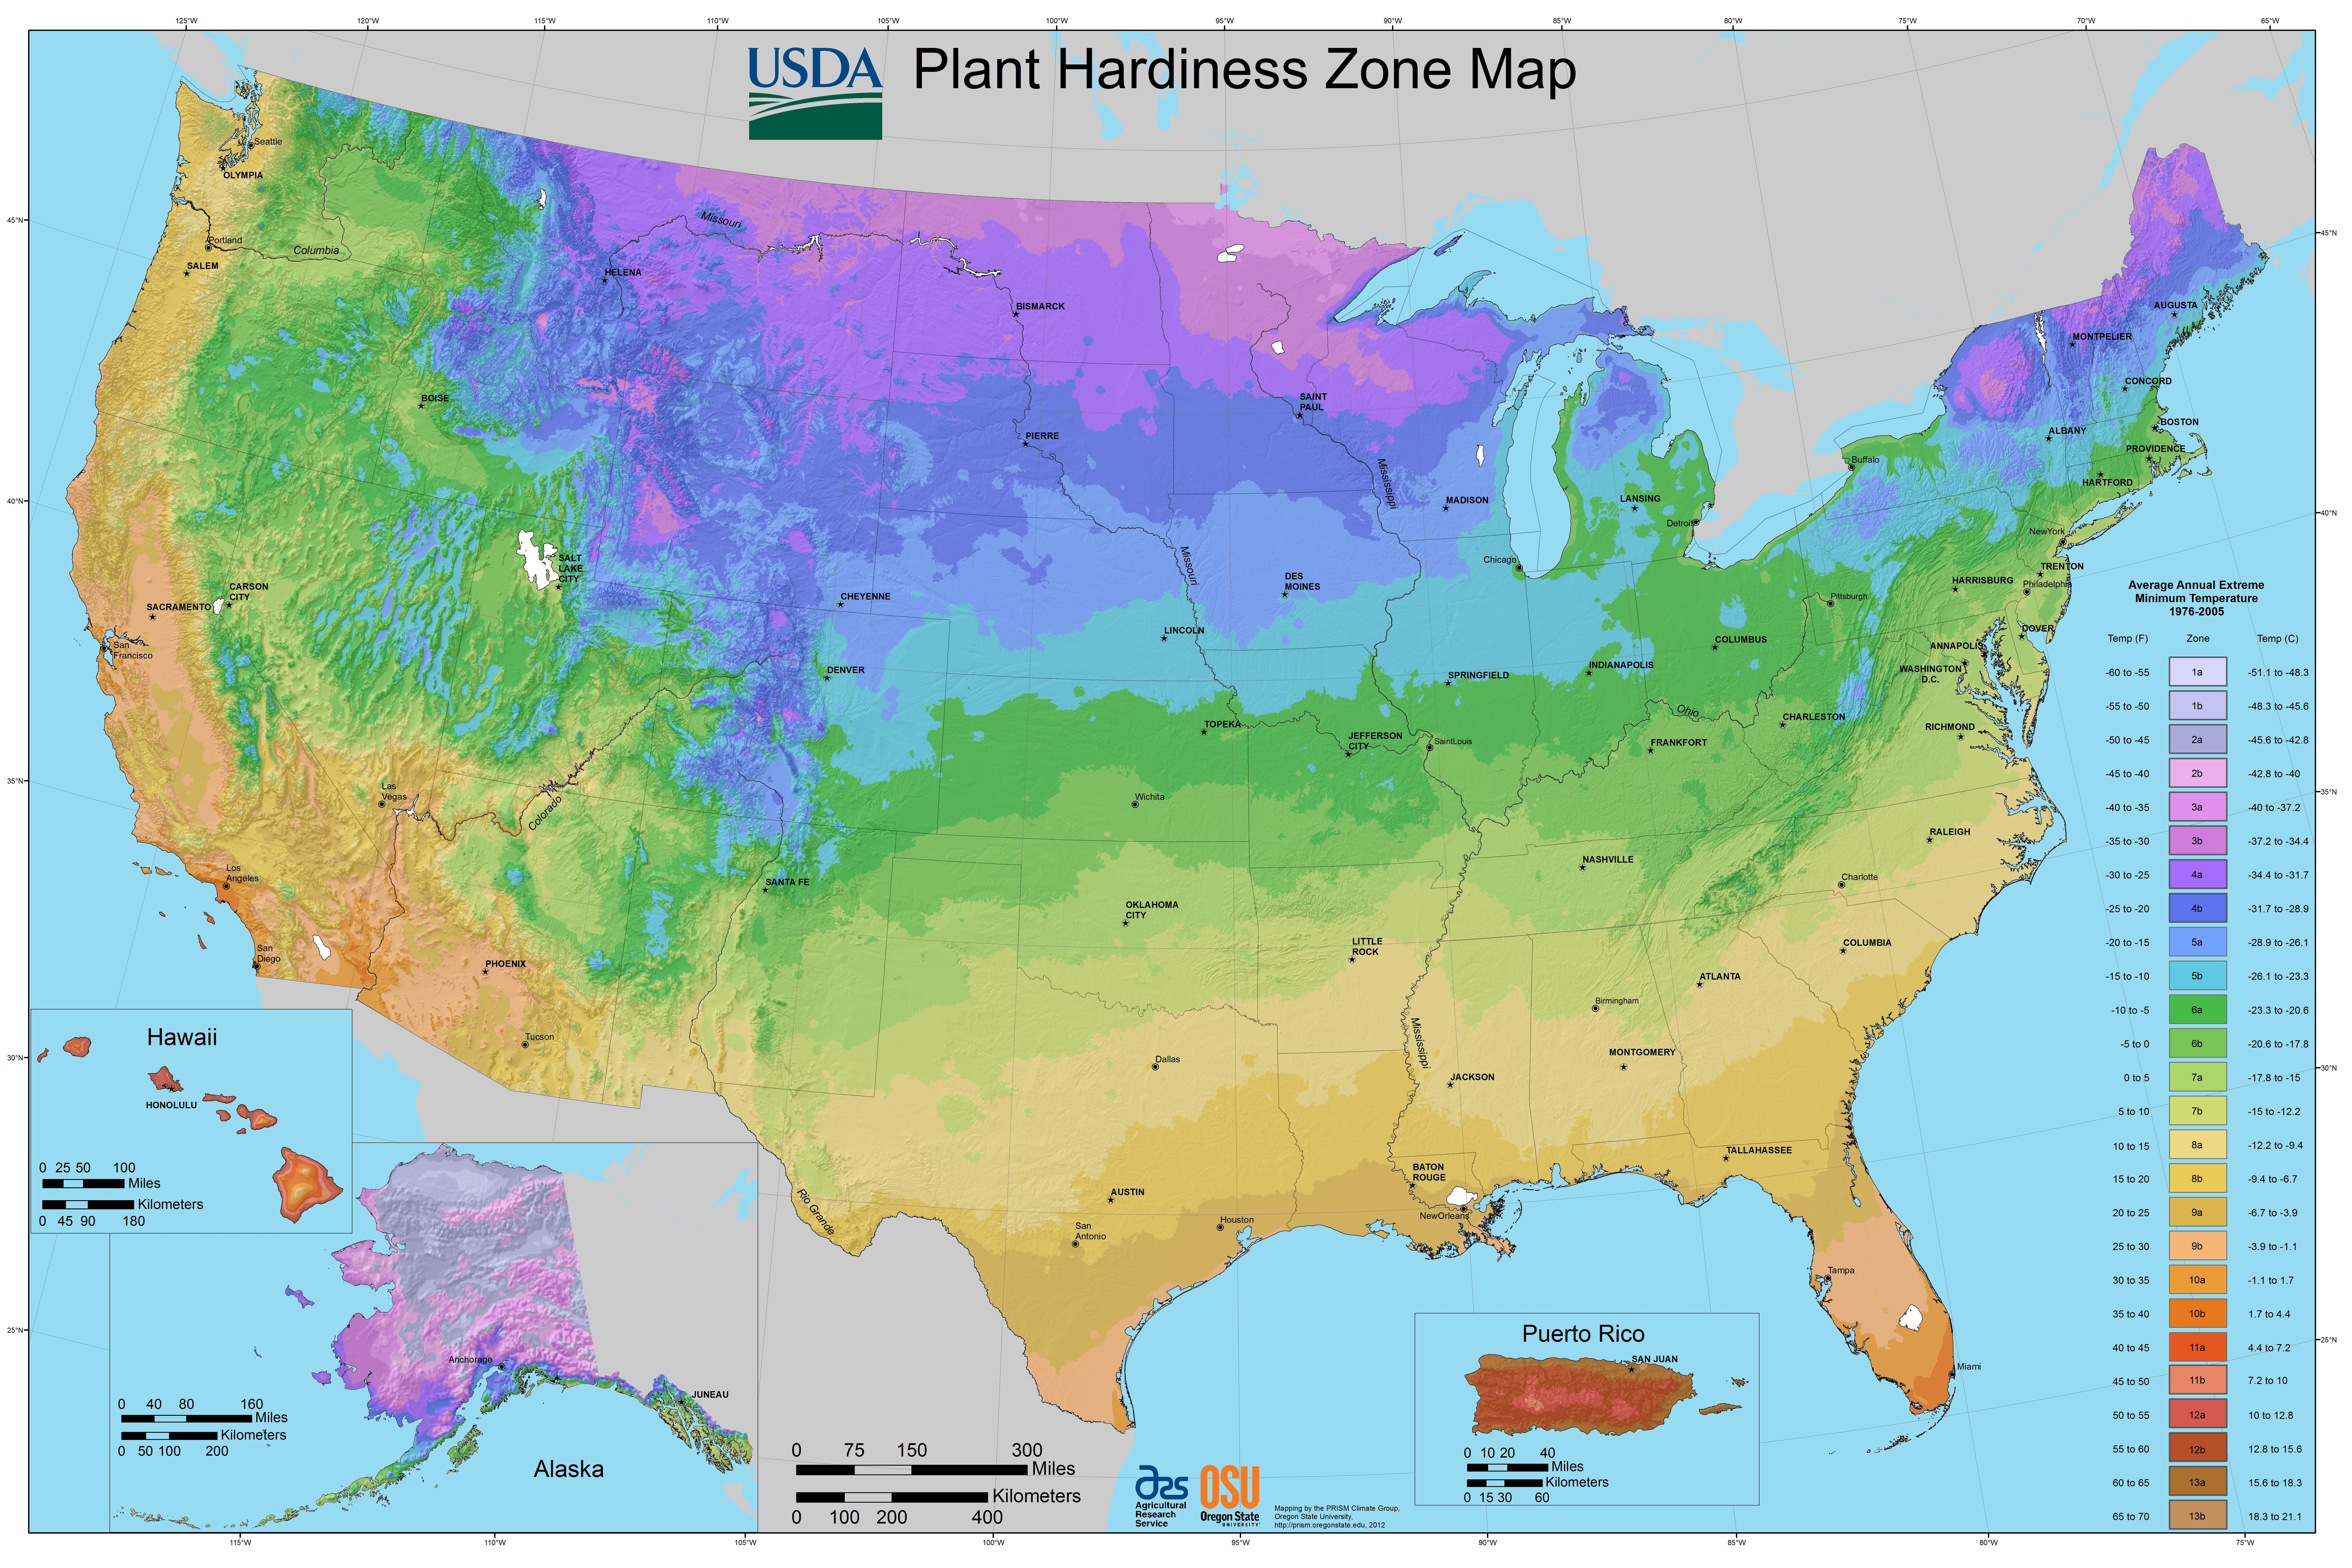 all-states-halfzones-poster-300dpi.jpg